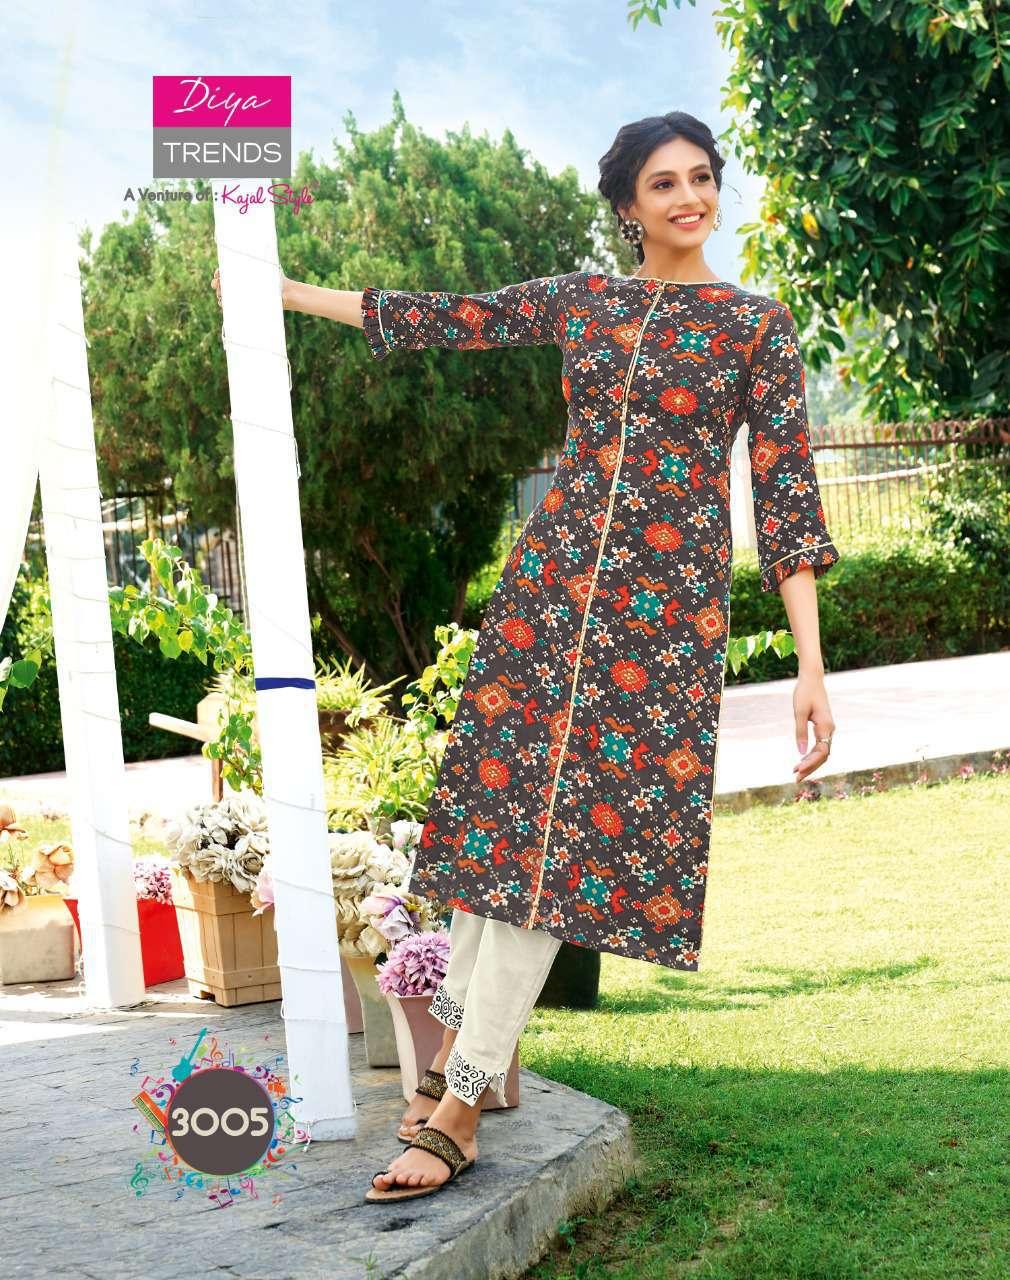 Diya Trends Forever Vol 3 by Kajal Style Kurti with Pant Wholesale Catalog 12 Pcs 5 - Diya Trends Forever Vol 3 by Kajal Style Kurti with Pant Wholesale Catalog 12 Pcs